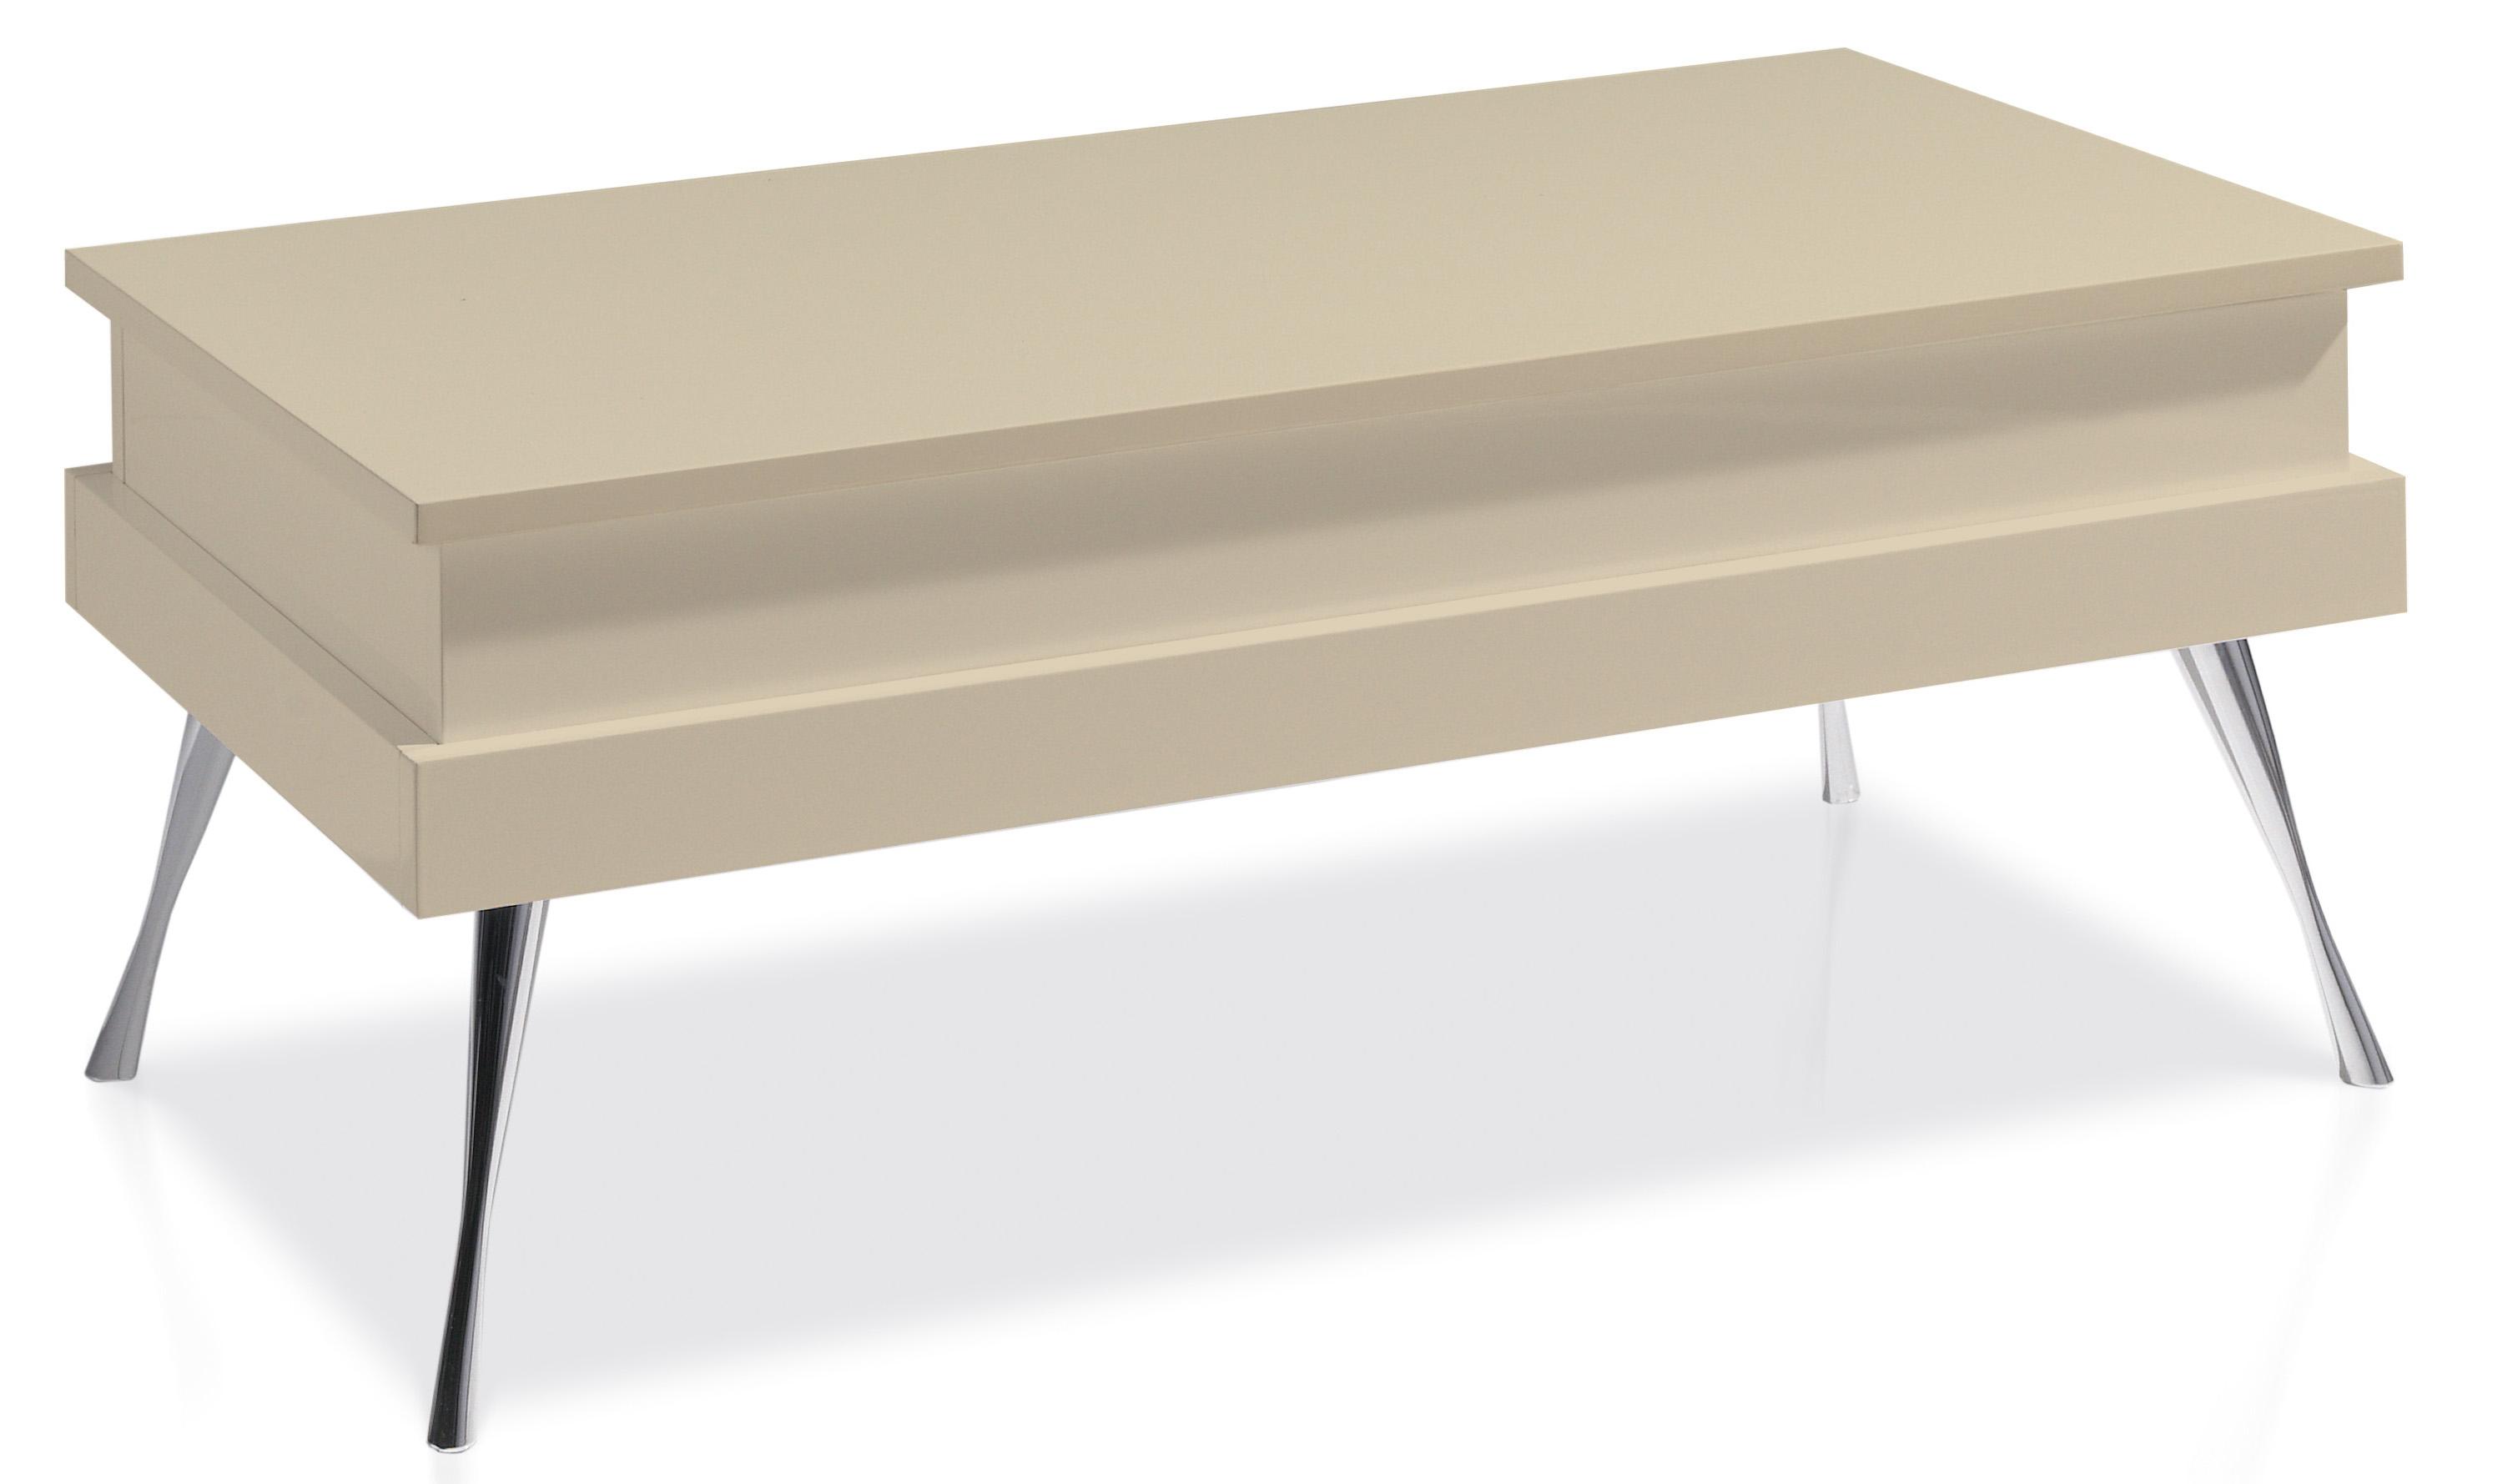 table basse relevable laqu e cr me pied acier chrom. Black Bedroom Furniture Sets. Home Design Ideas